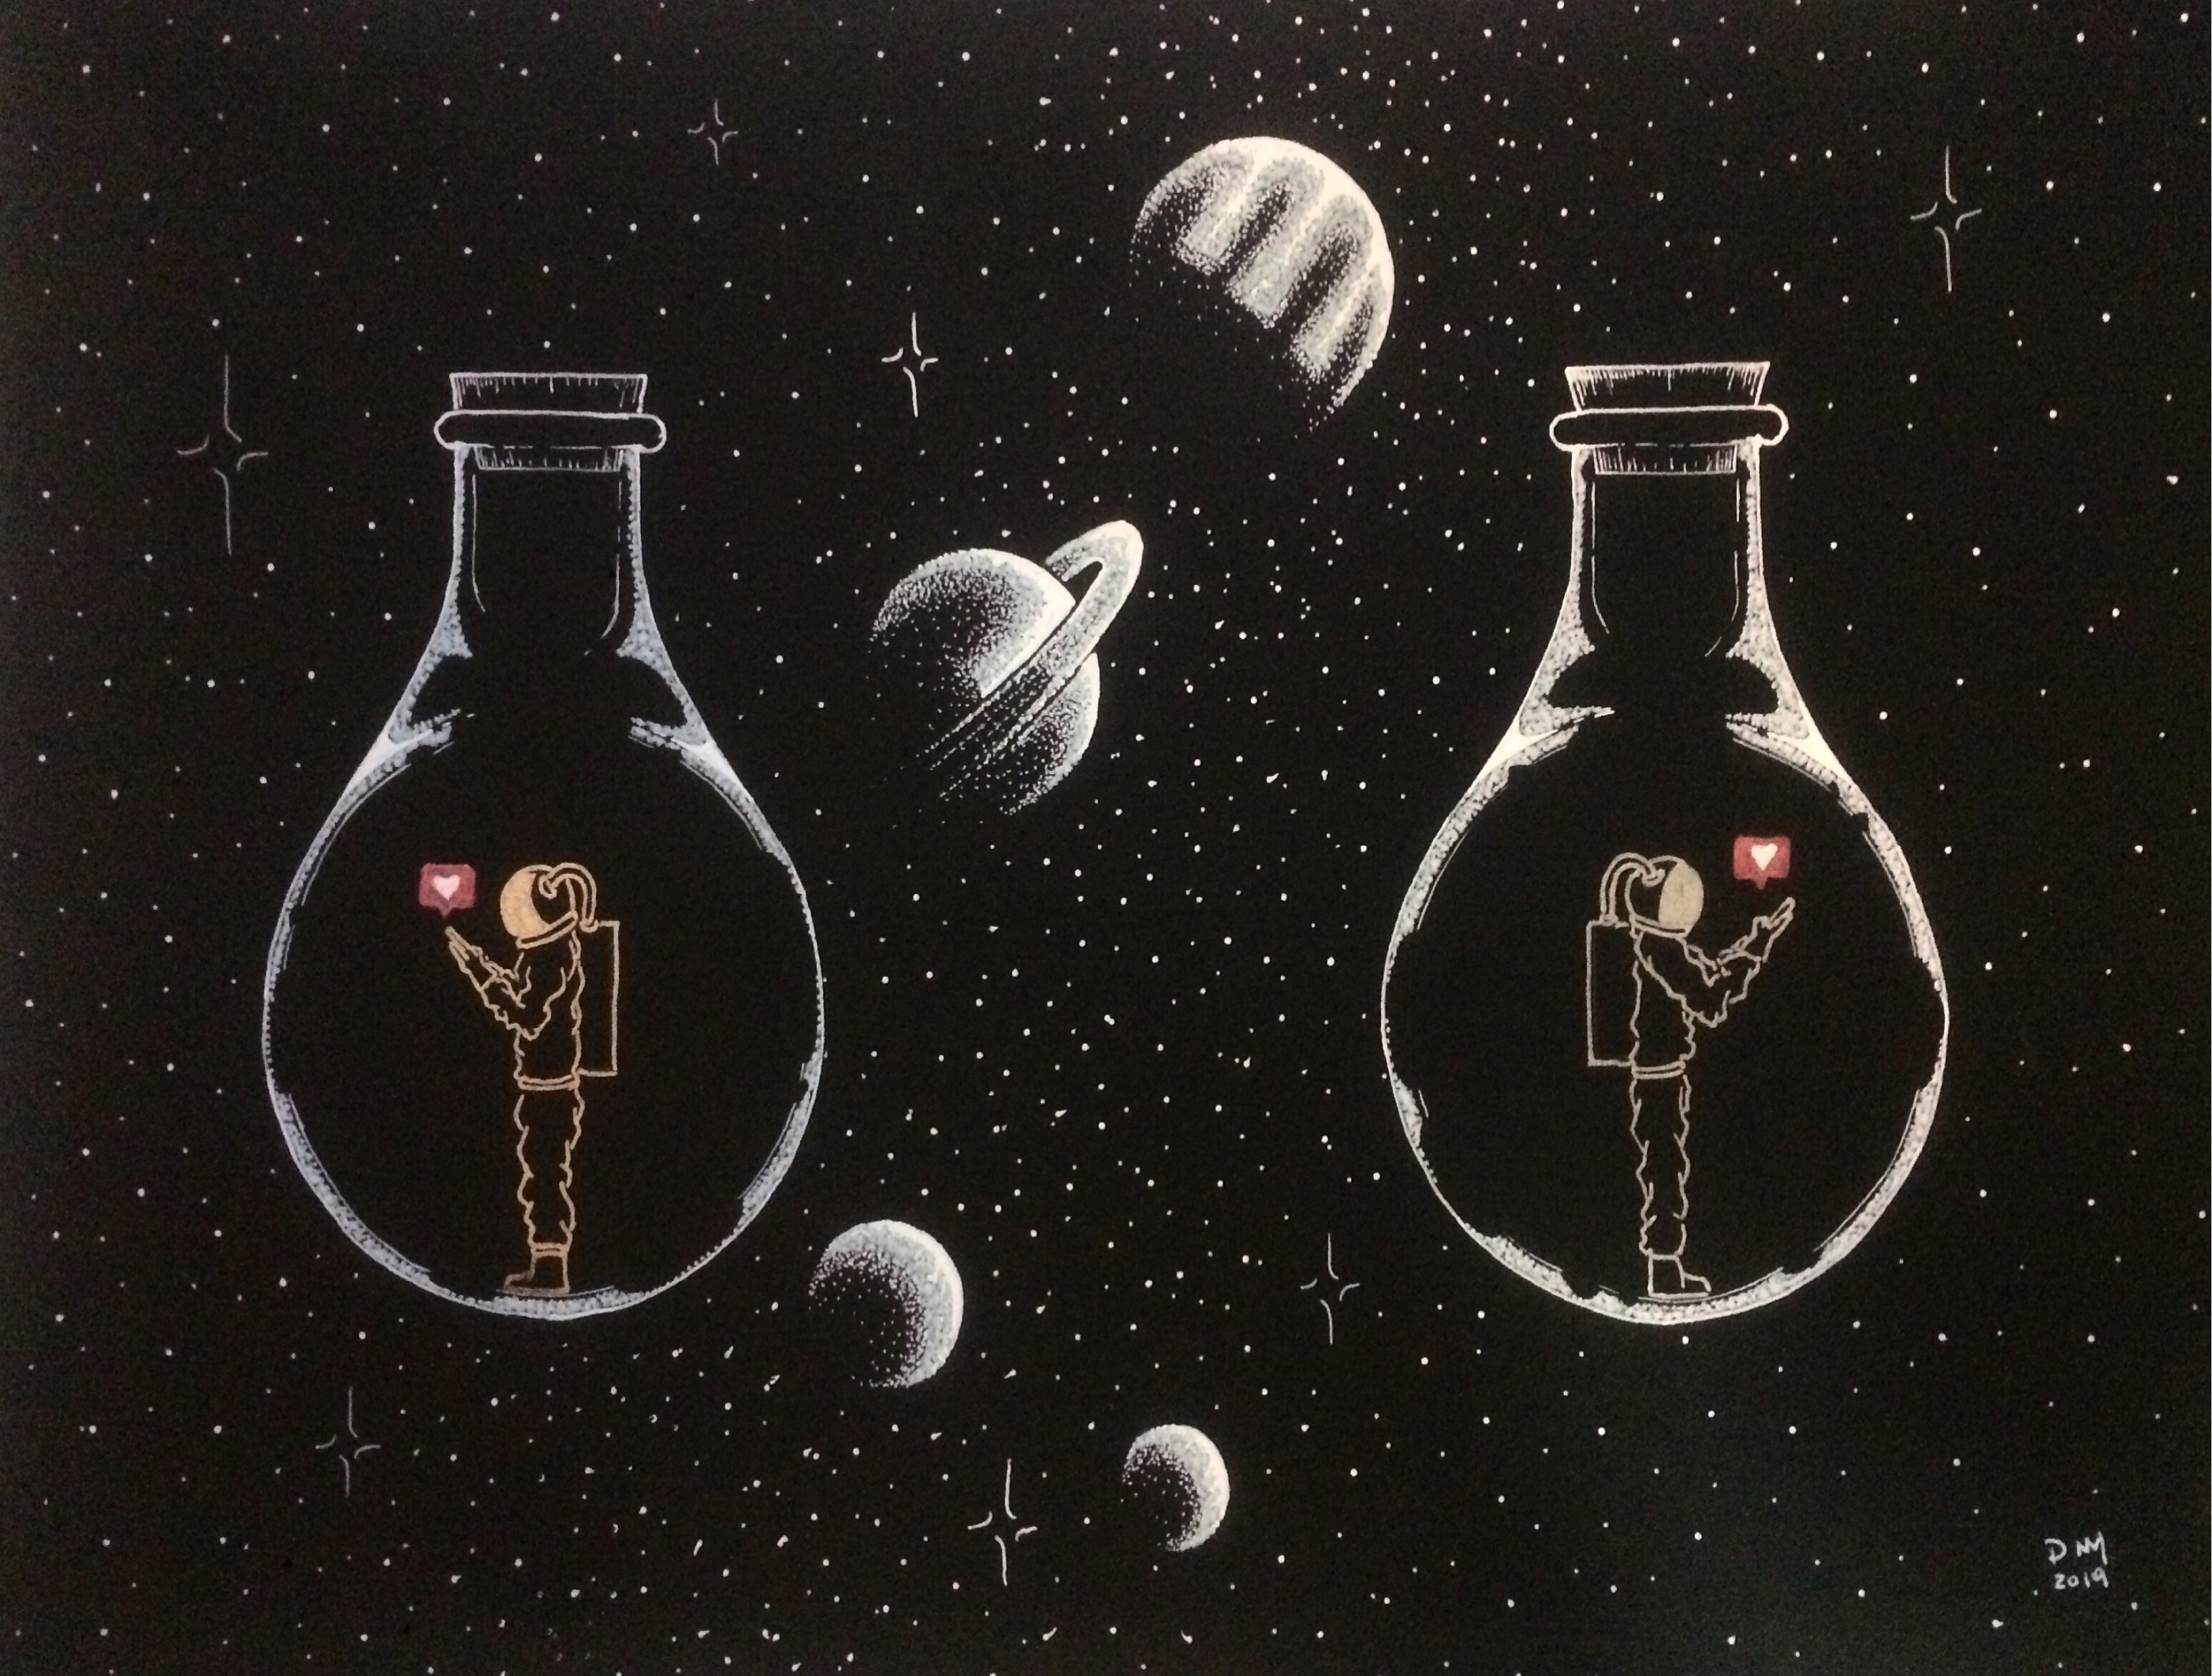 Spacetagram